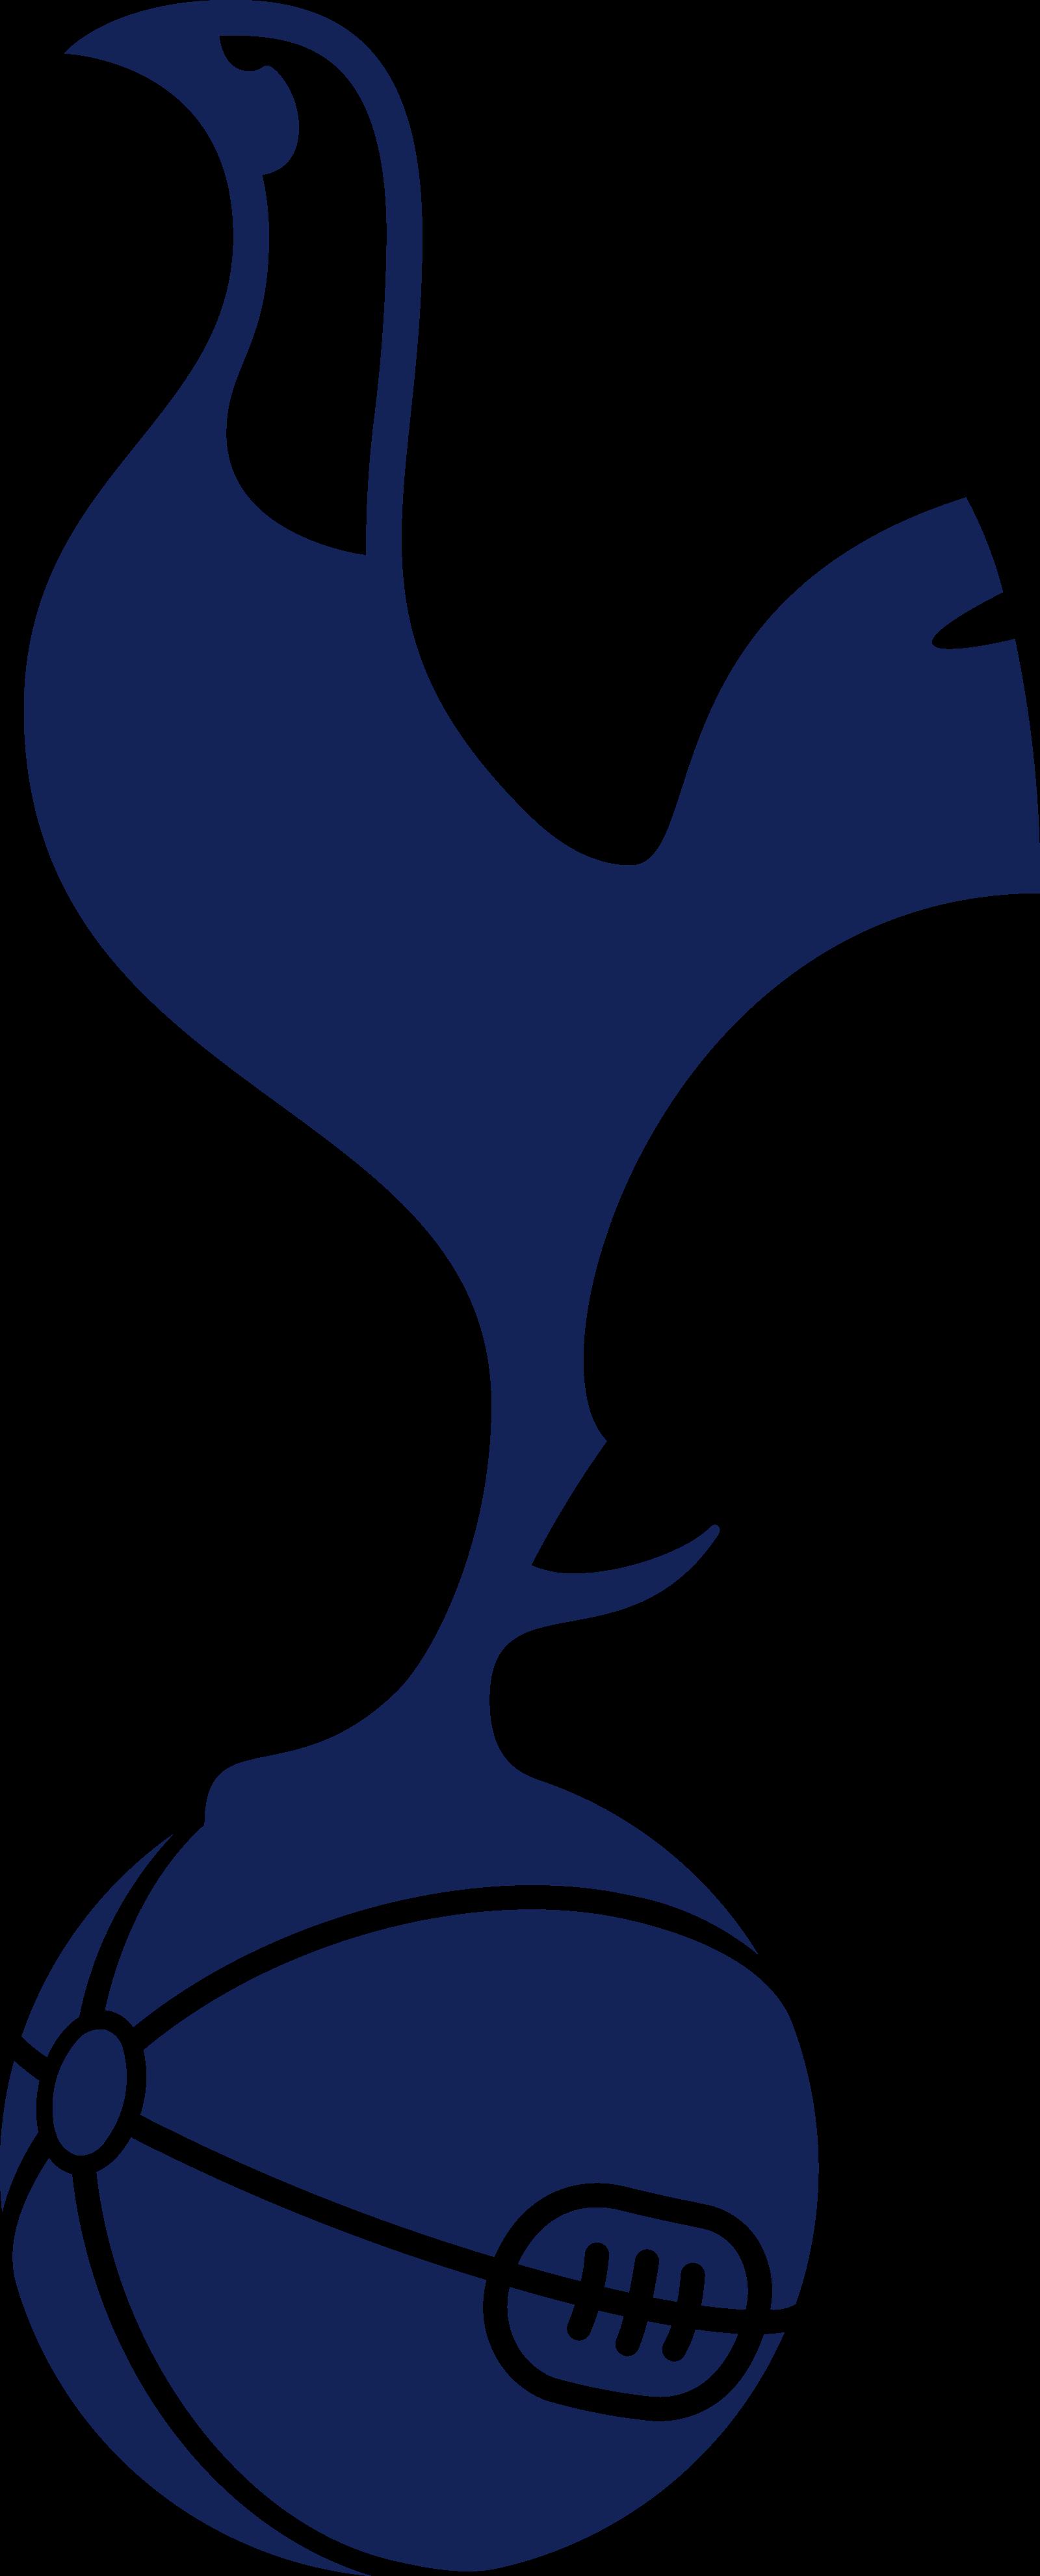 tottenham logo escudo 2 - Tottenham Hotspur FC Logo